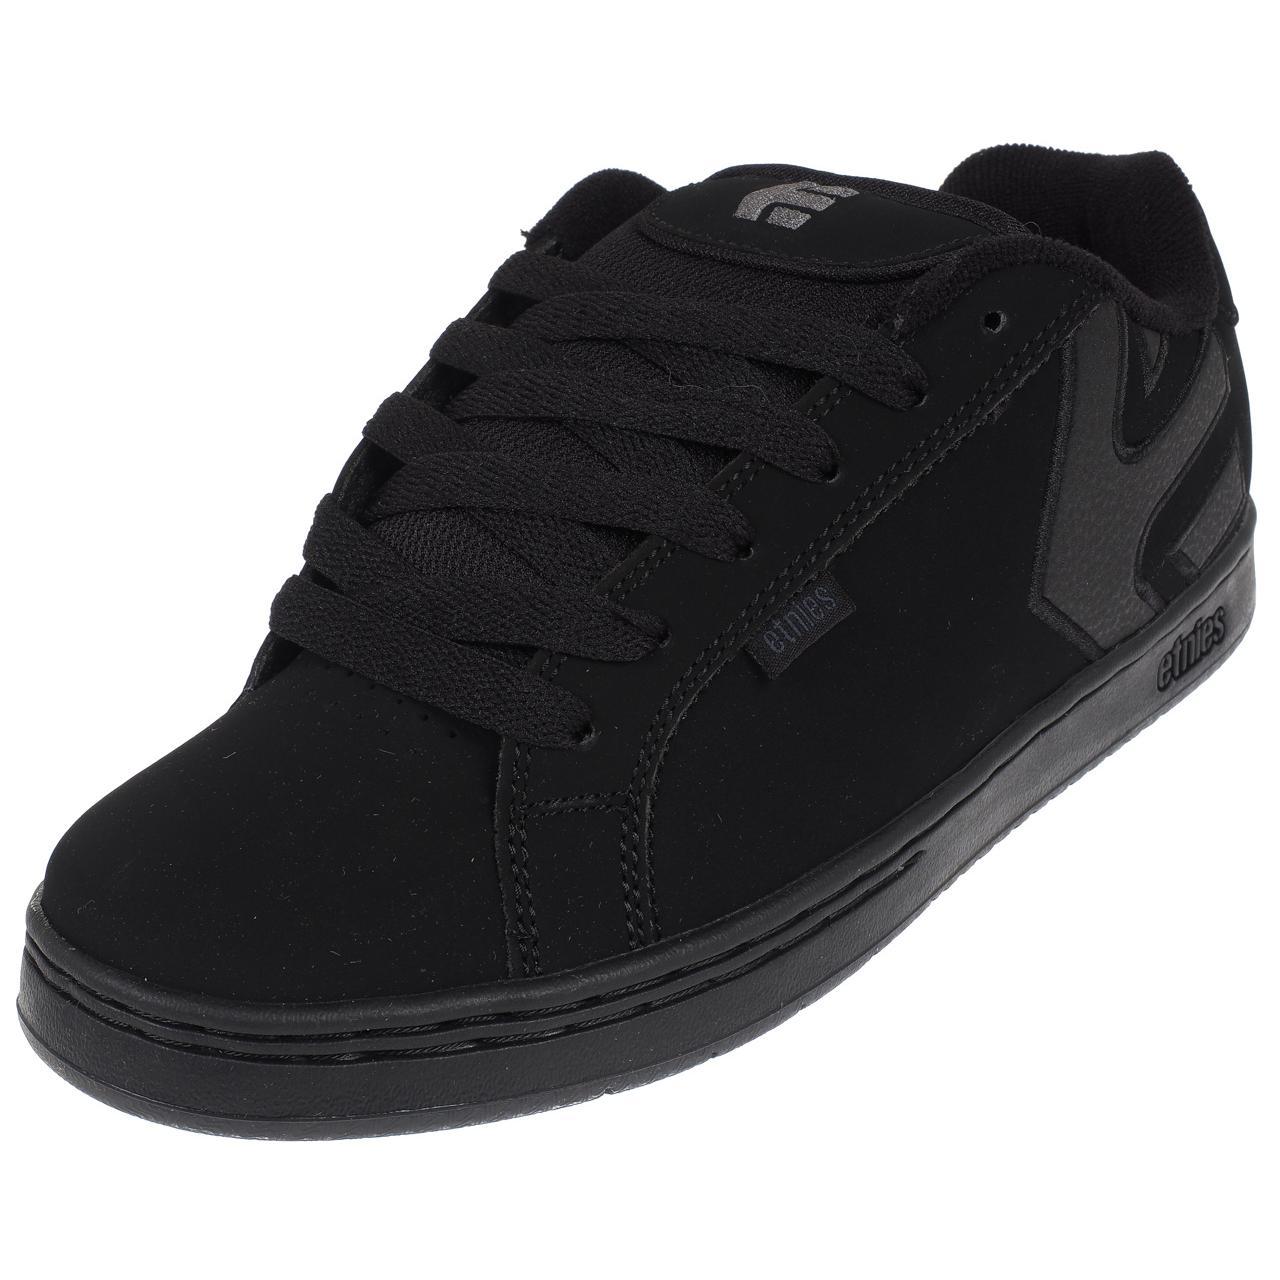 Shoes-Skateboard-Etnies-Fader-Black-Dirty-Wash-Black-42823-New